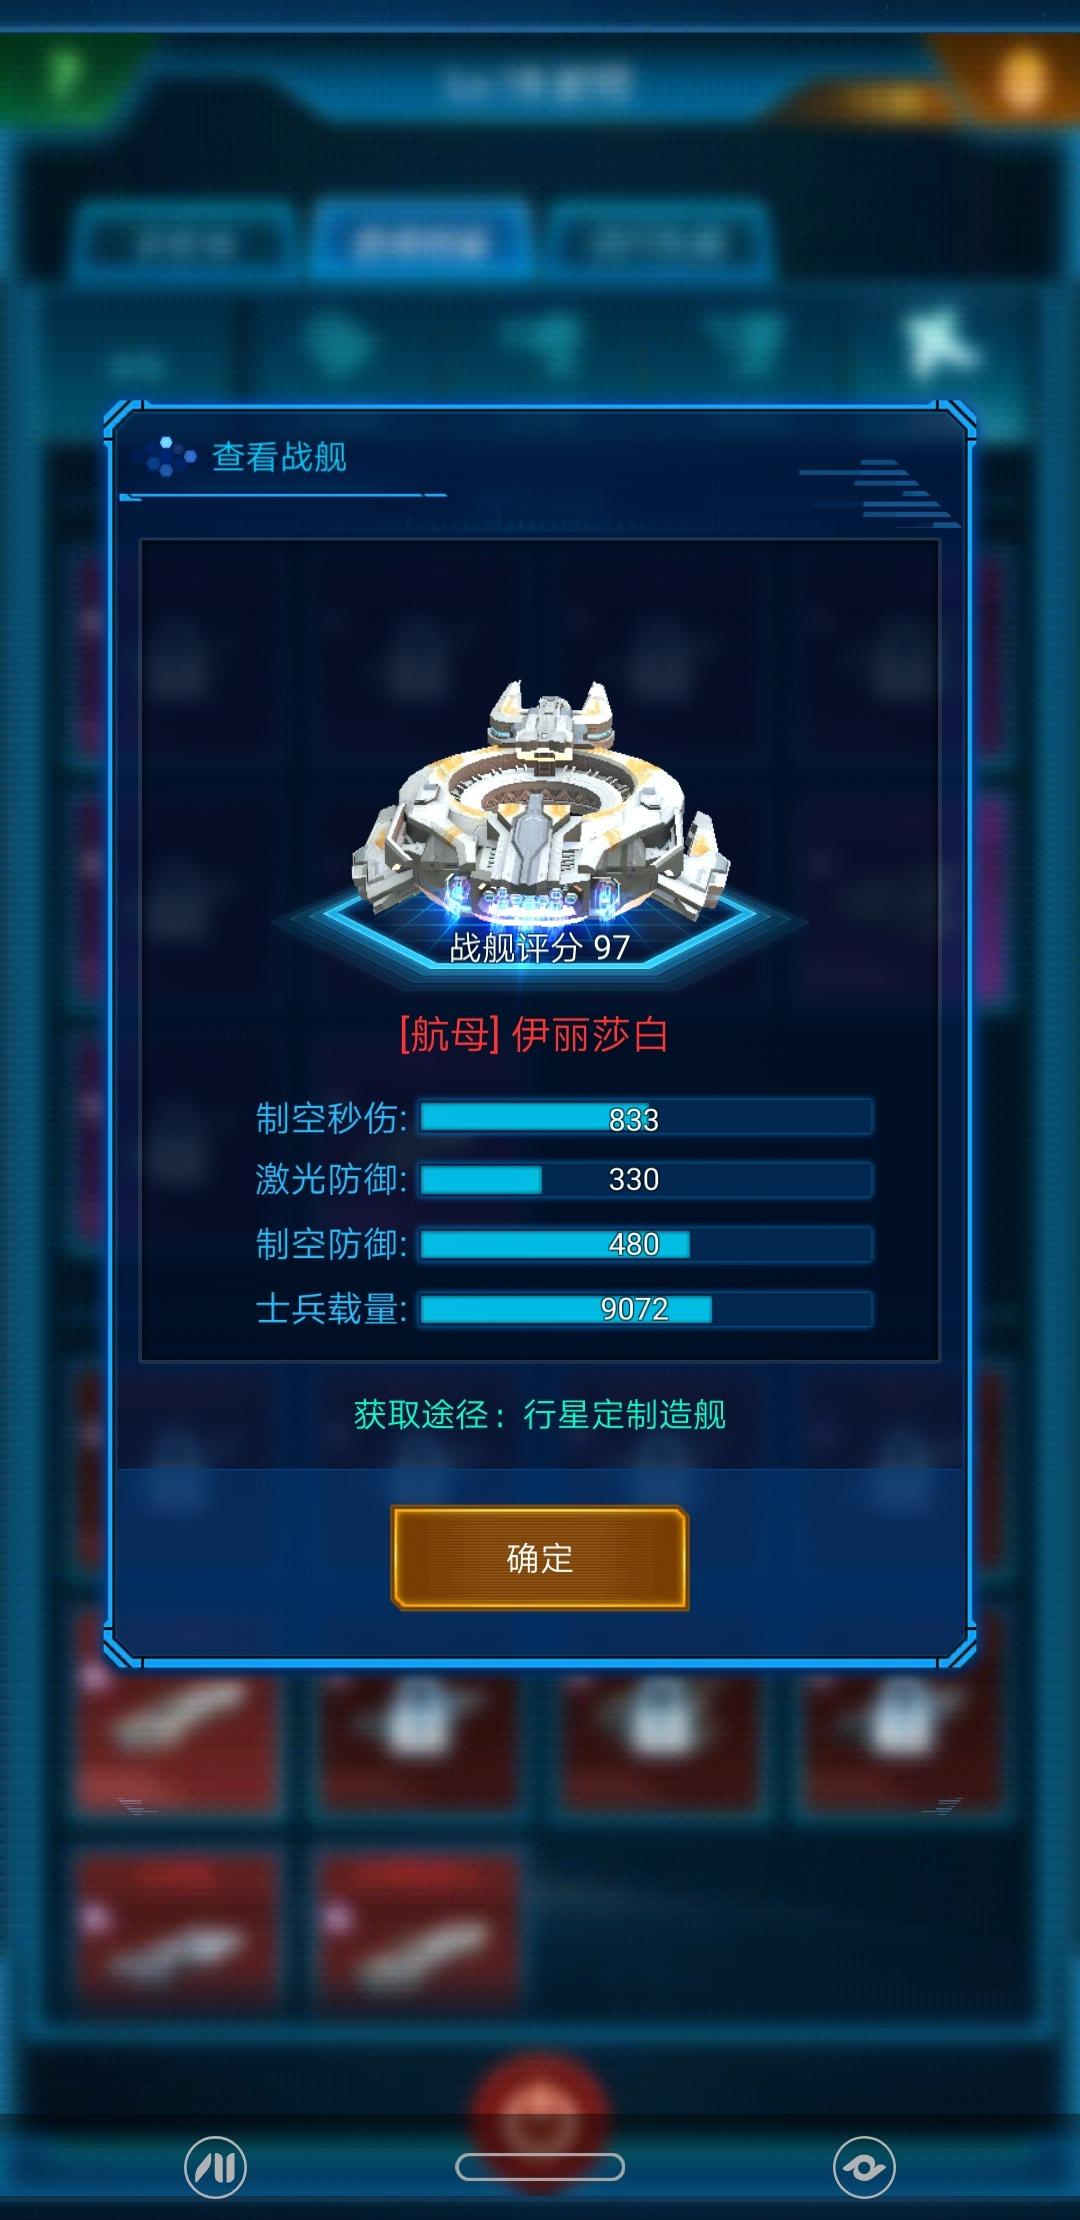 Screenshot_20190810_072248_com.jedigames.p16s.huawei.jpg